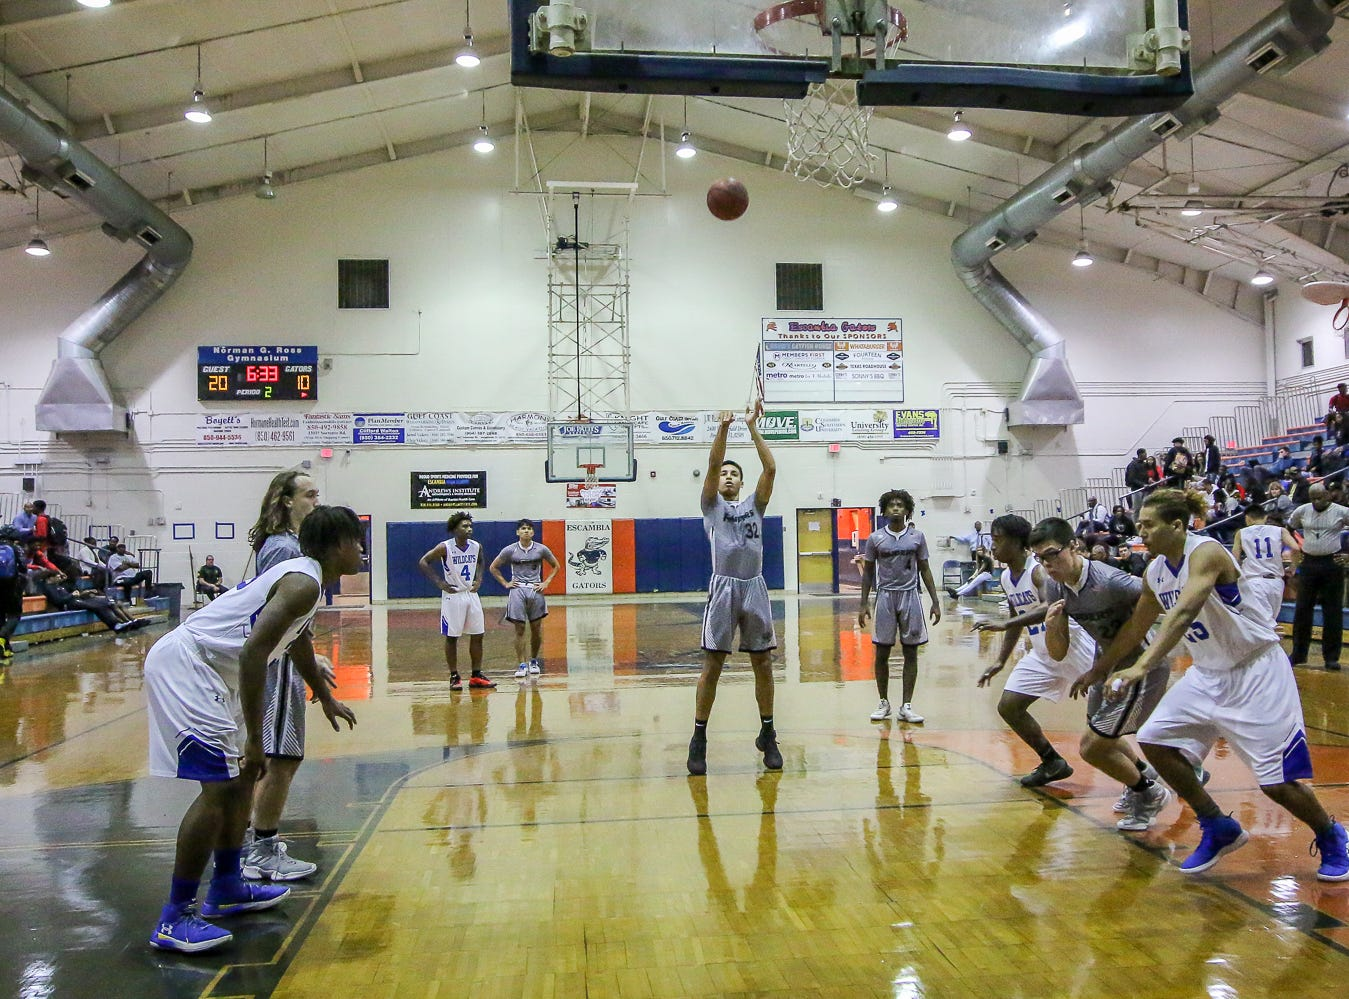 Navarre's David Melega (23) shoots a free throw against Washington in the preseason basketball jamboree at Escambia High School on Tuesday, November 20, 2018.